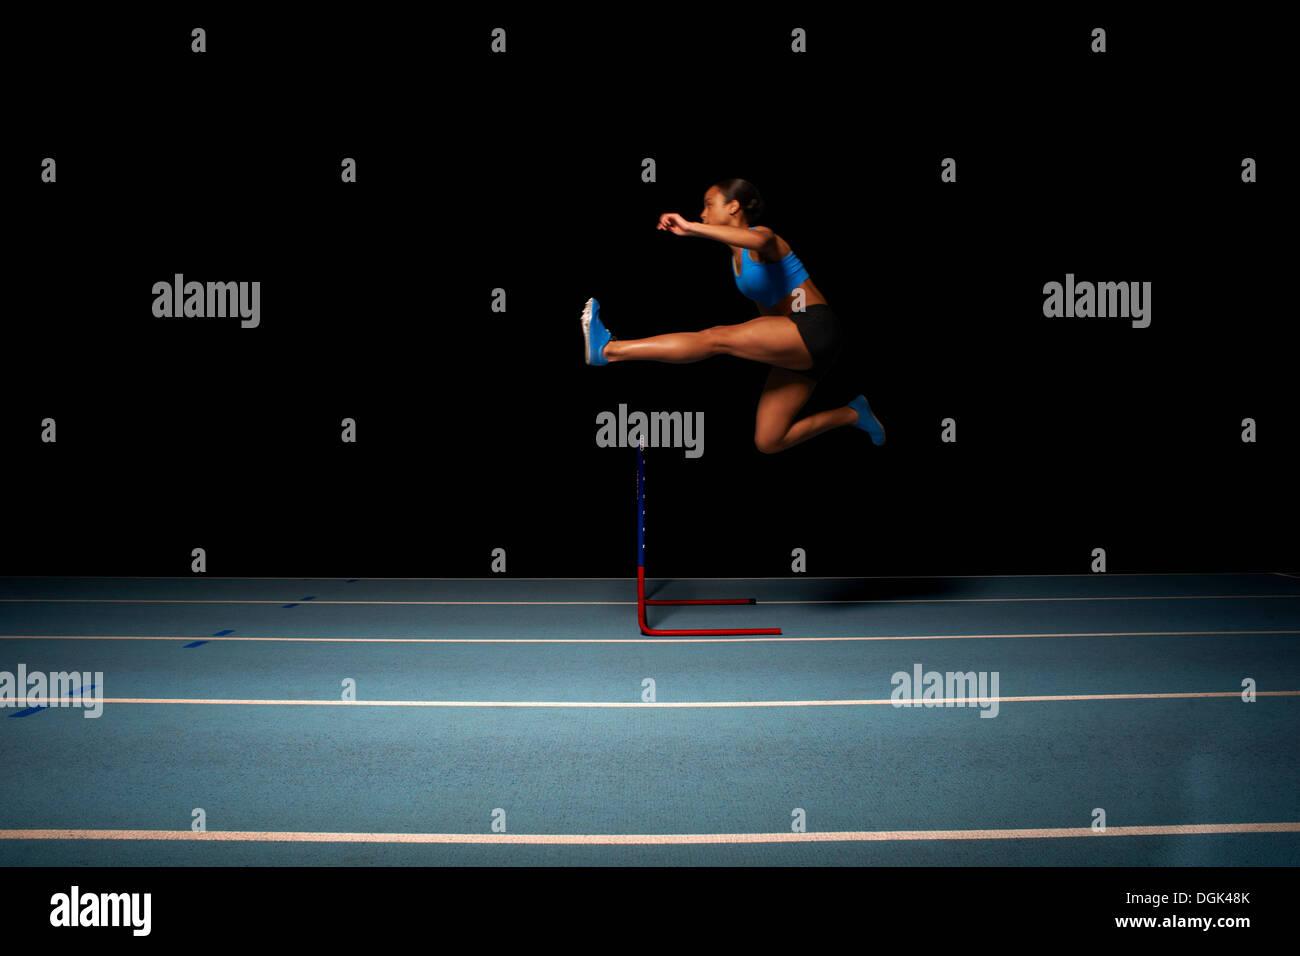 La atleta femenina joven saltando valla Imagen De Stock